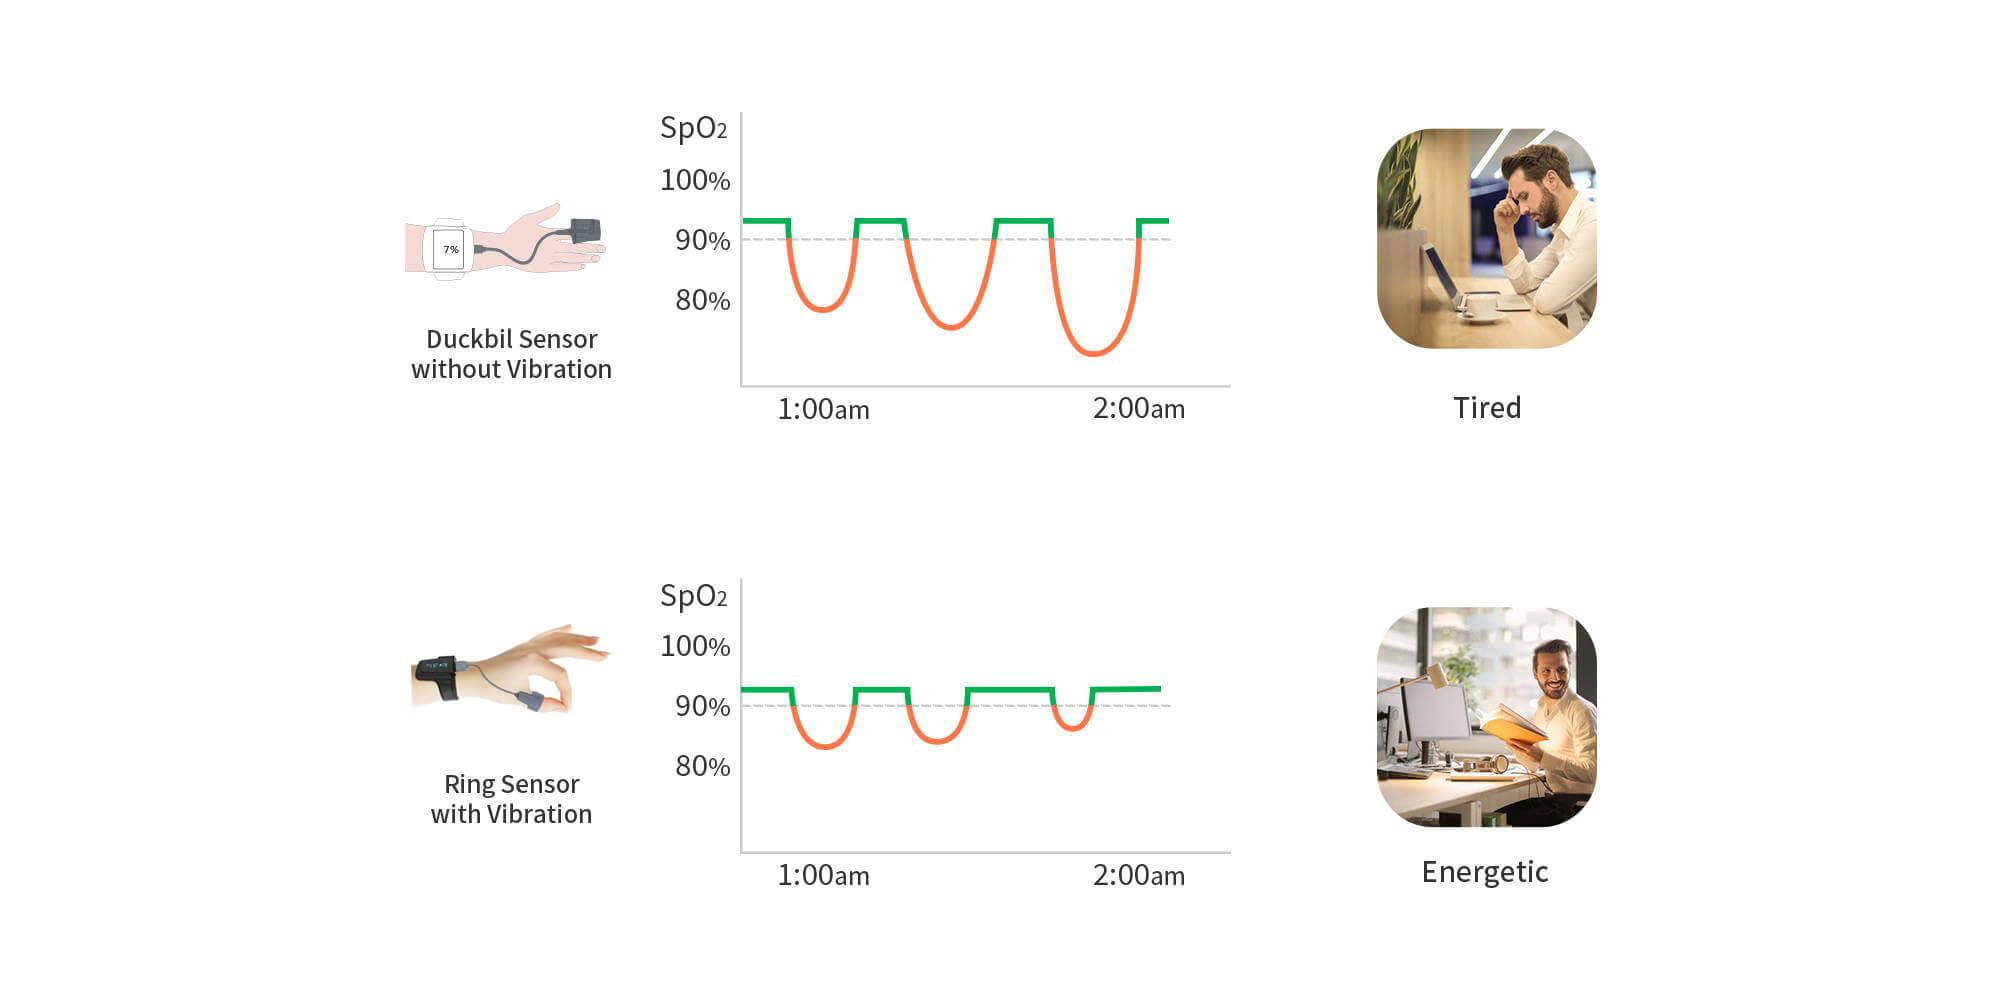 Wellue SleepU Wrist Pulse Oximeter sleep apnea monitor vibraton alarm